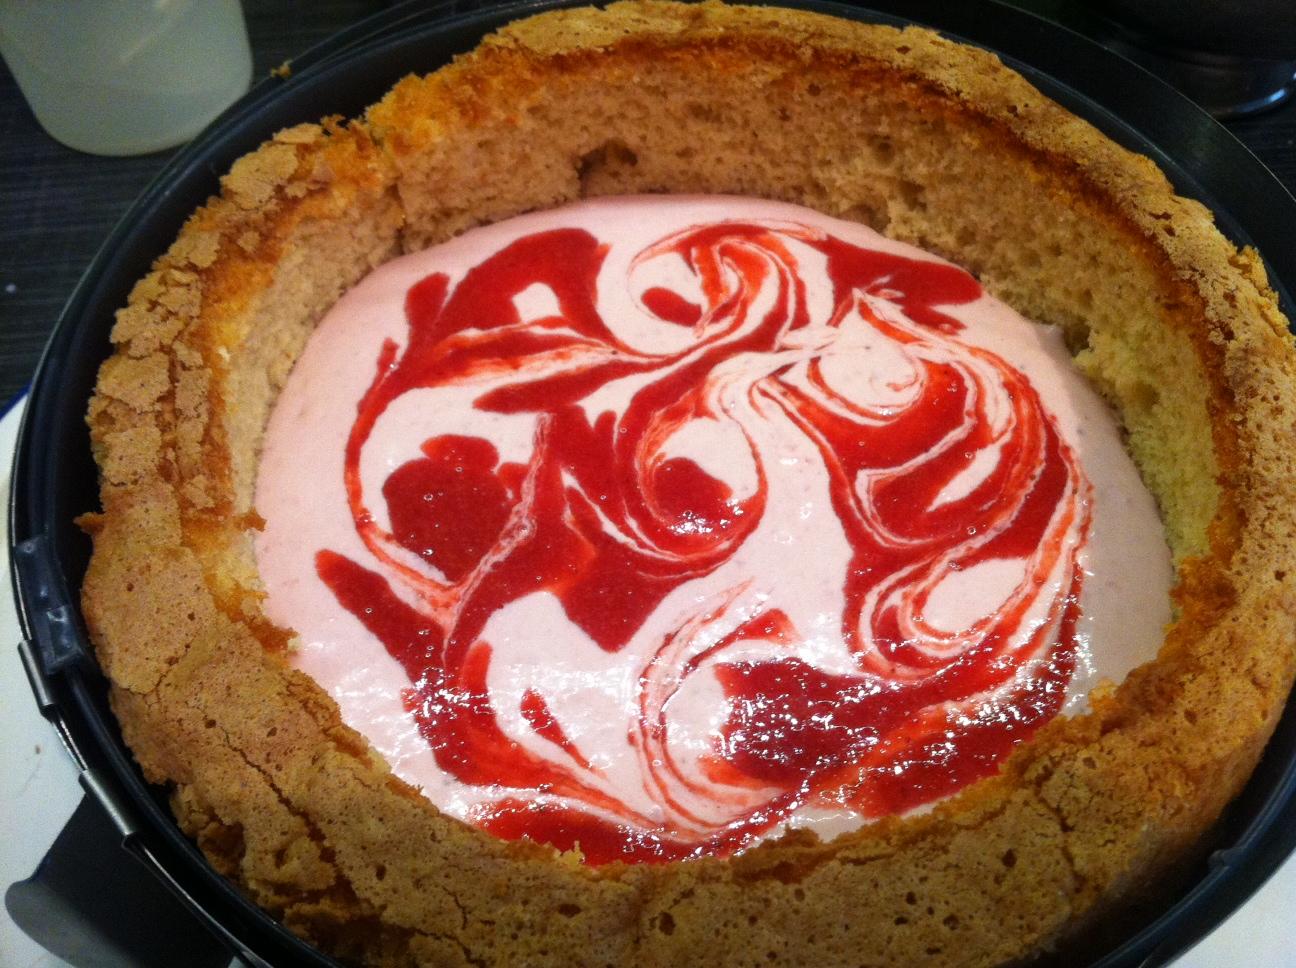 Rezept fr meine LieblingsMotivtortenfllung Erdbeer